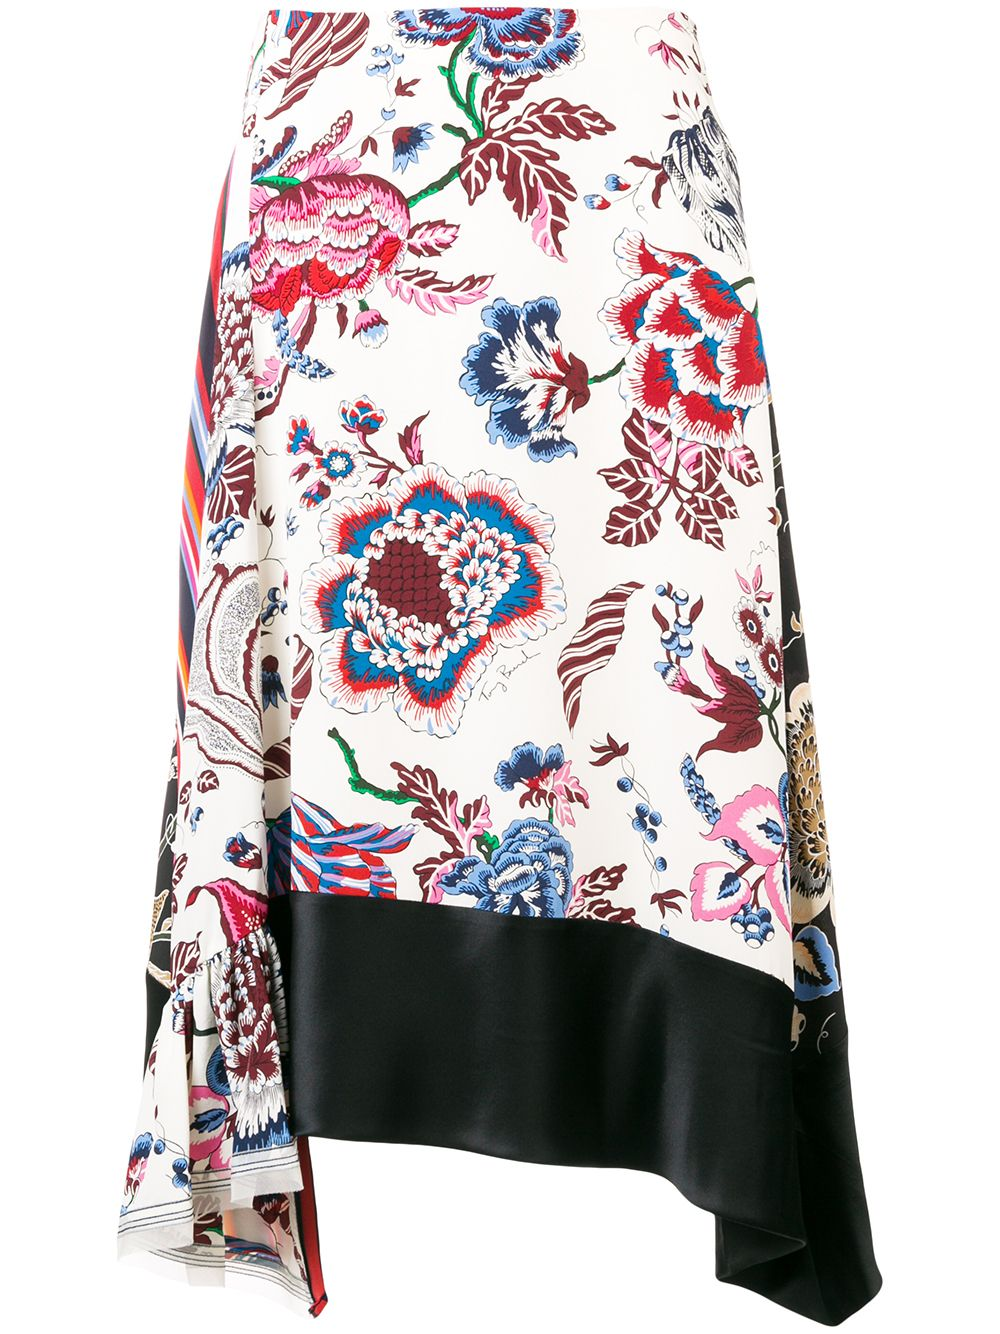 Tory Burch | асимметричная юбка с цветочным принтом | Clouty